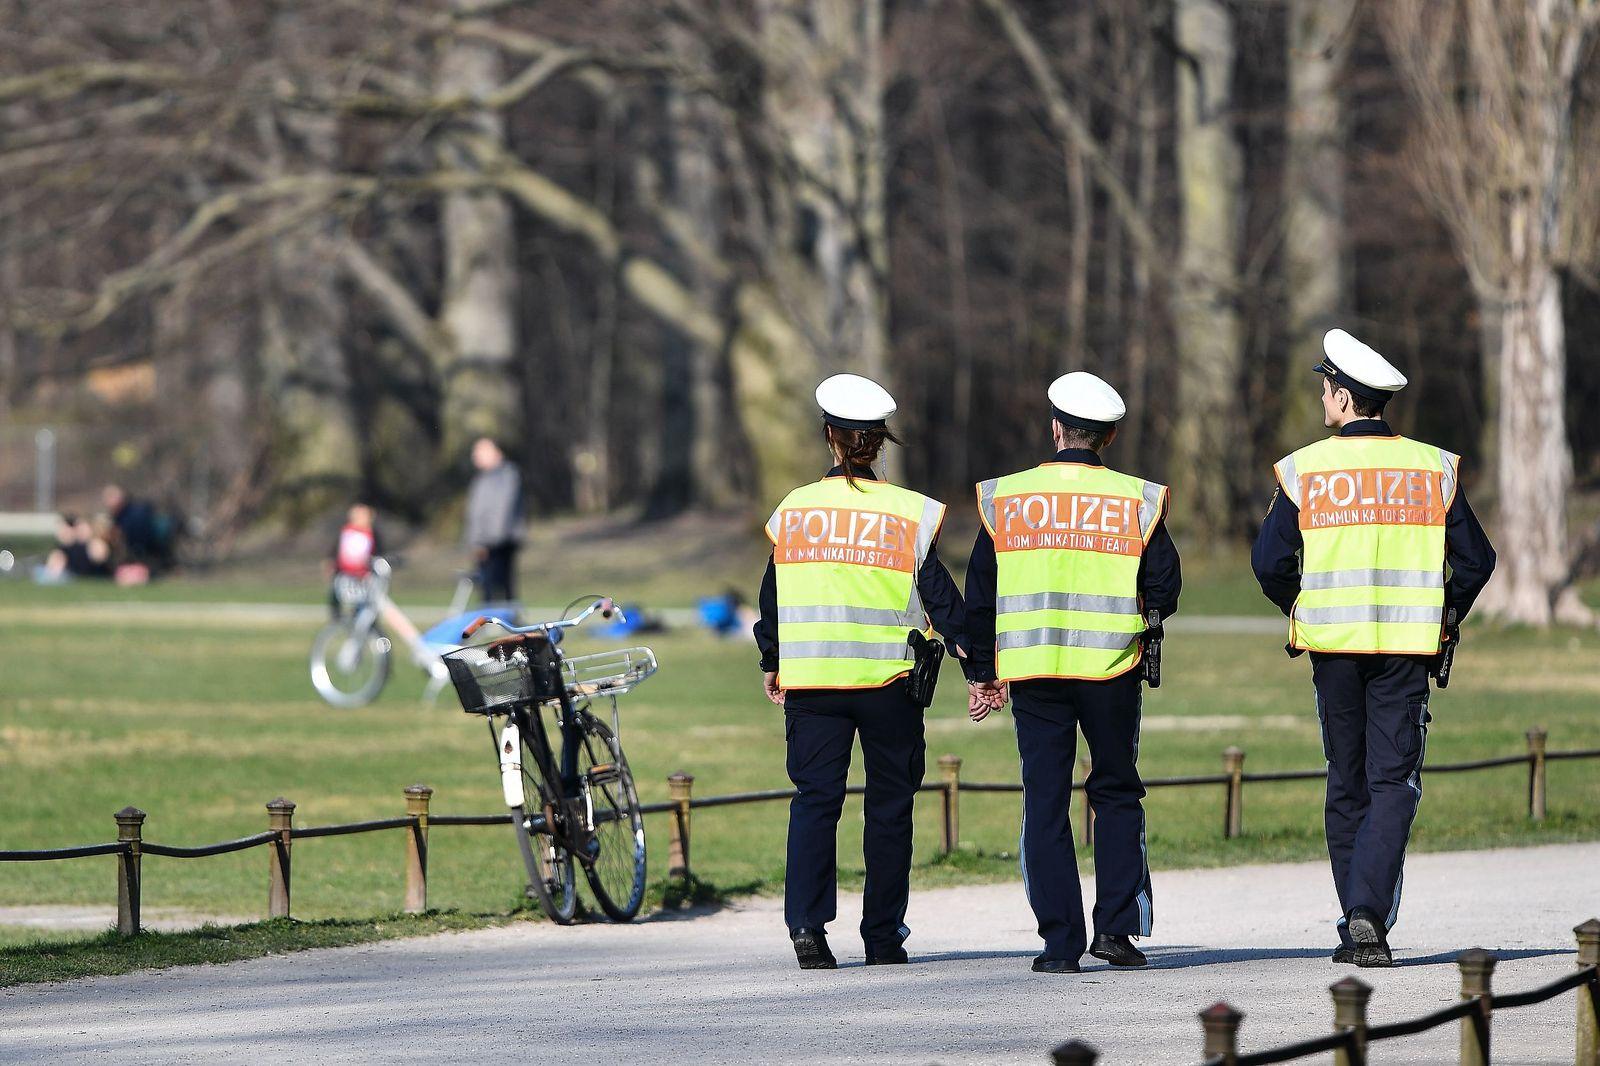 Daily life in Munich during coronavirus pandemic, Germany - 20 Mar 2020